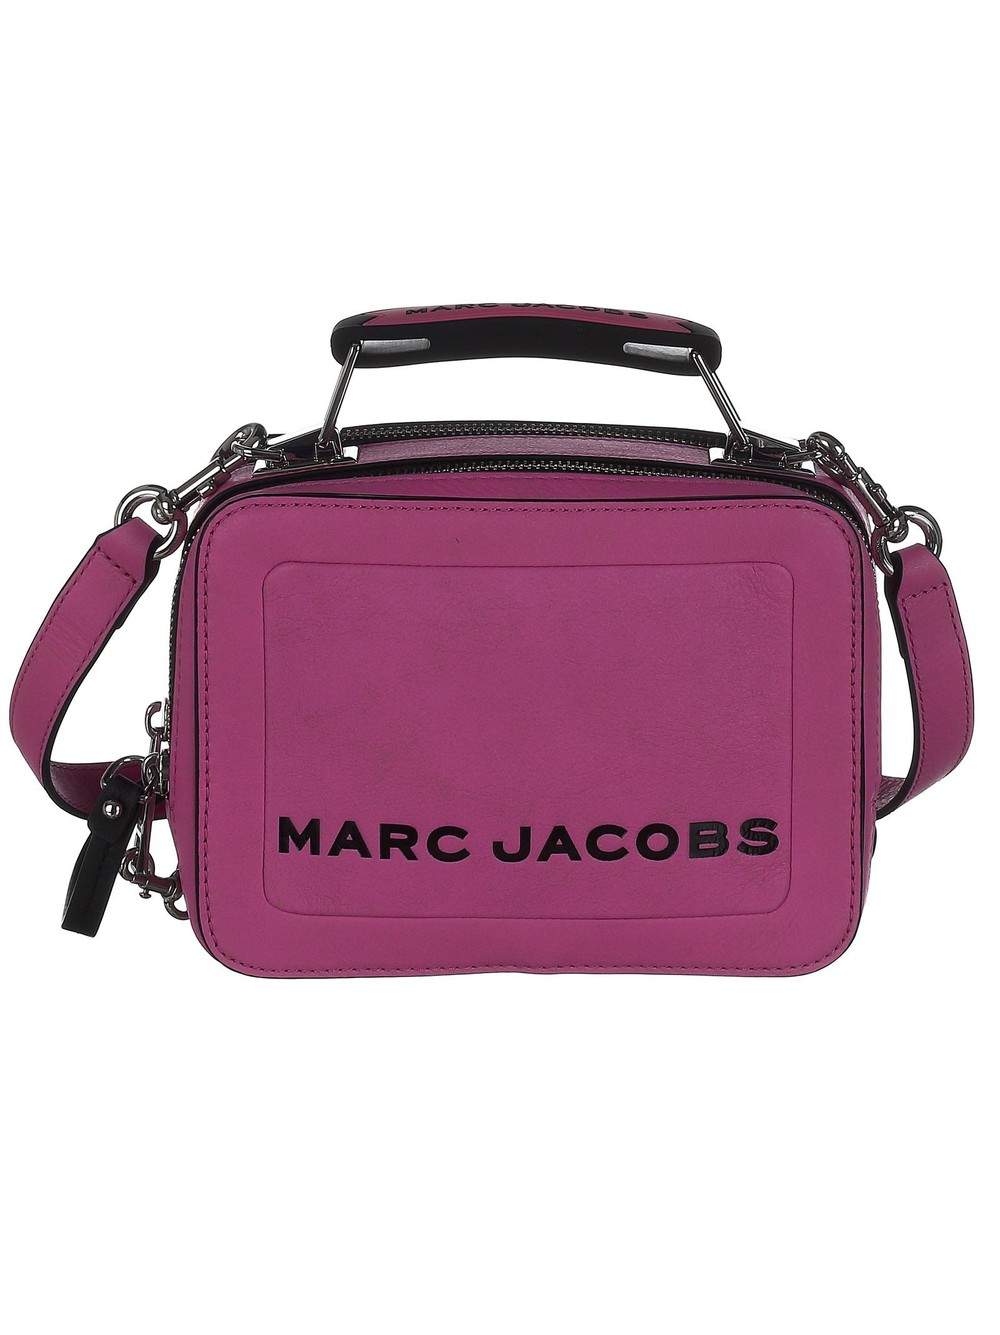 Marc Jacobs The Box Shoulder Bag in pink